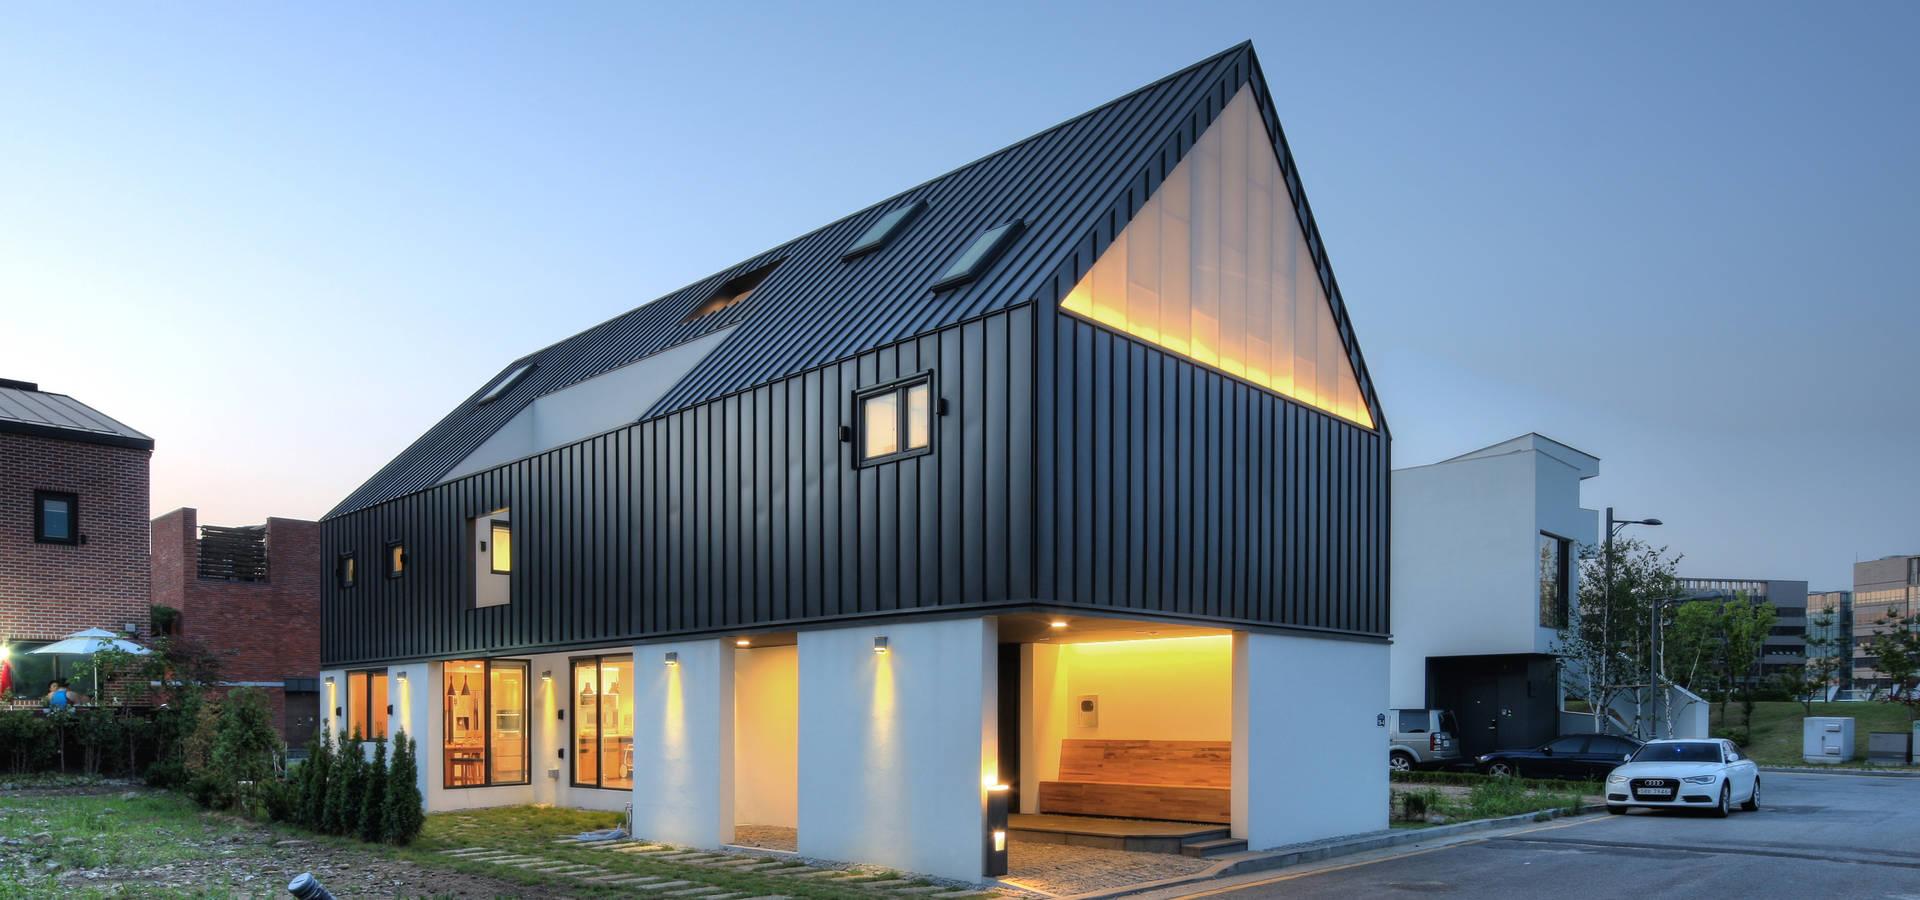 mlnp architects